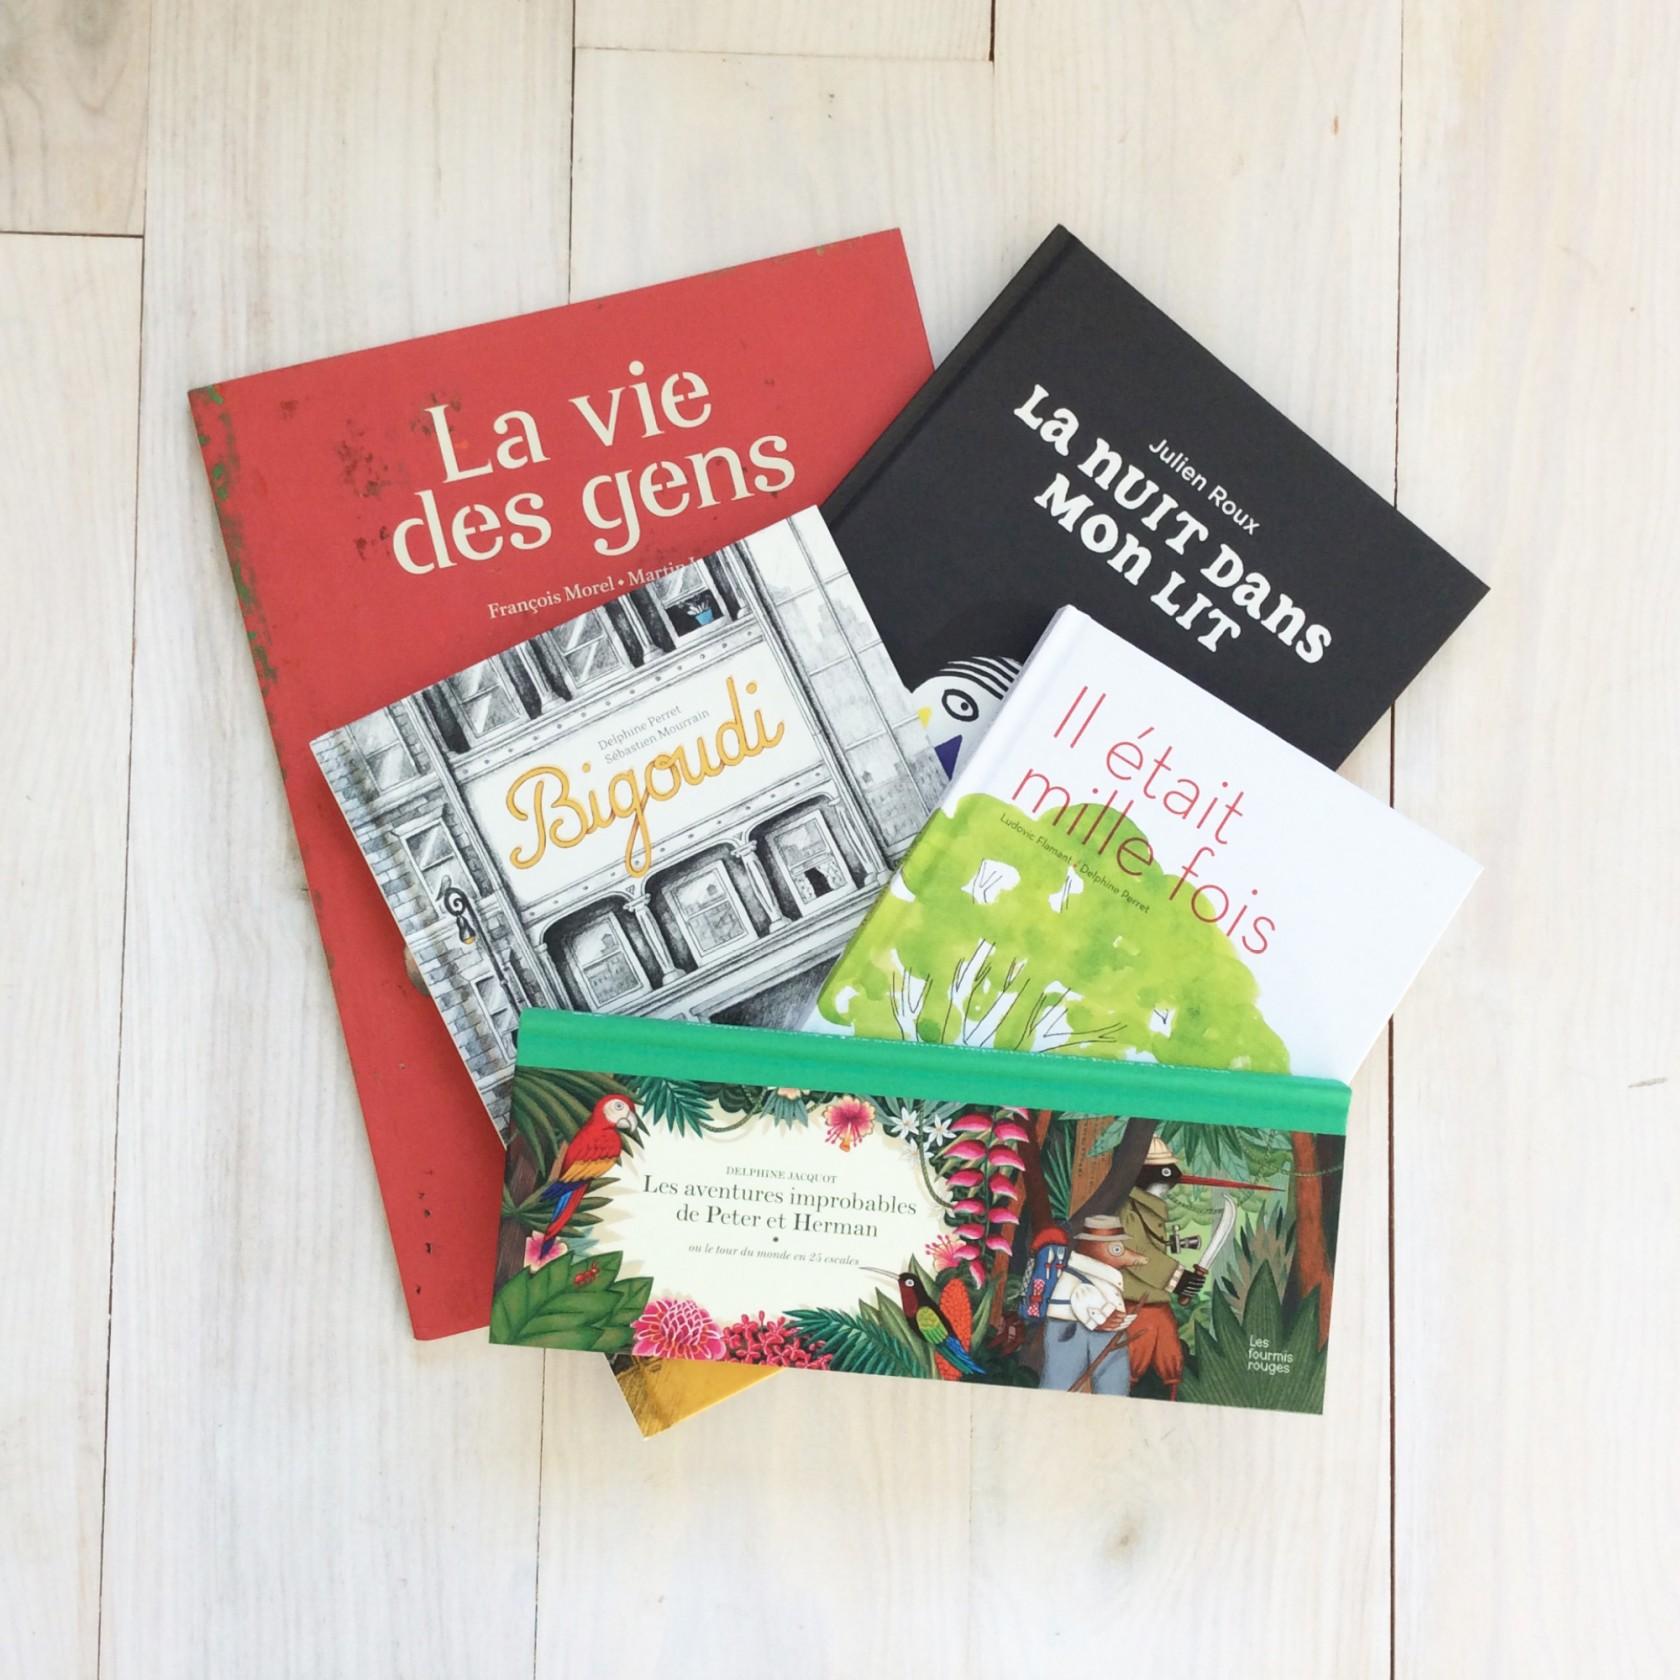 fouinzanardi -  fz_print.books_lesfourmsirouges5